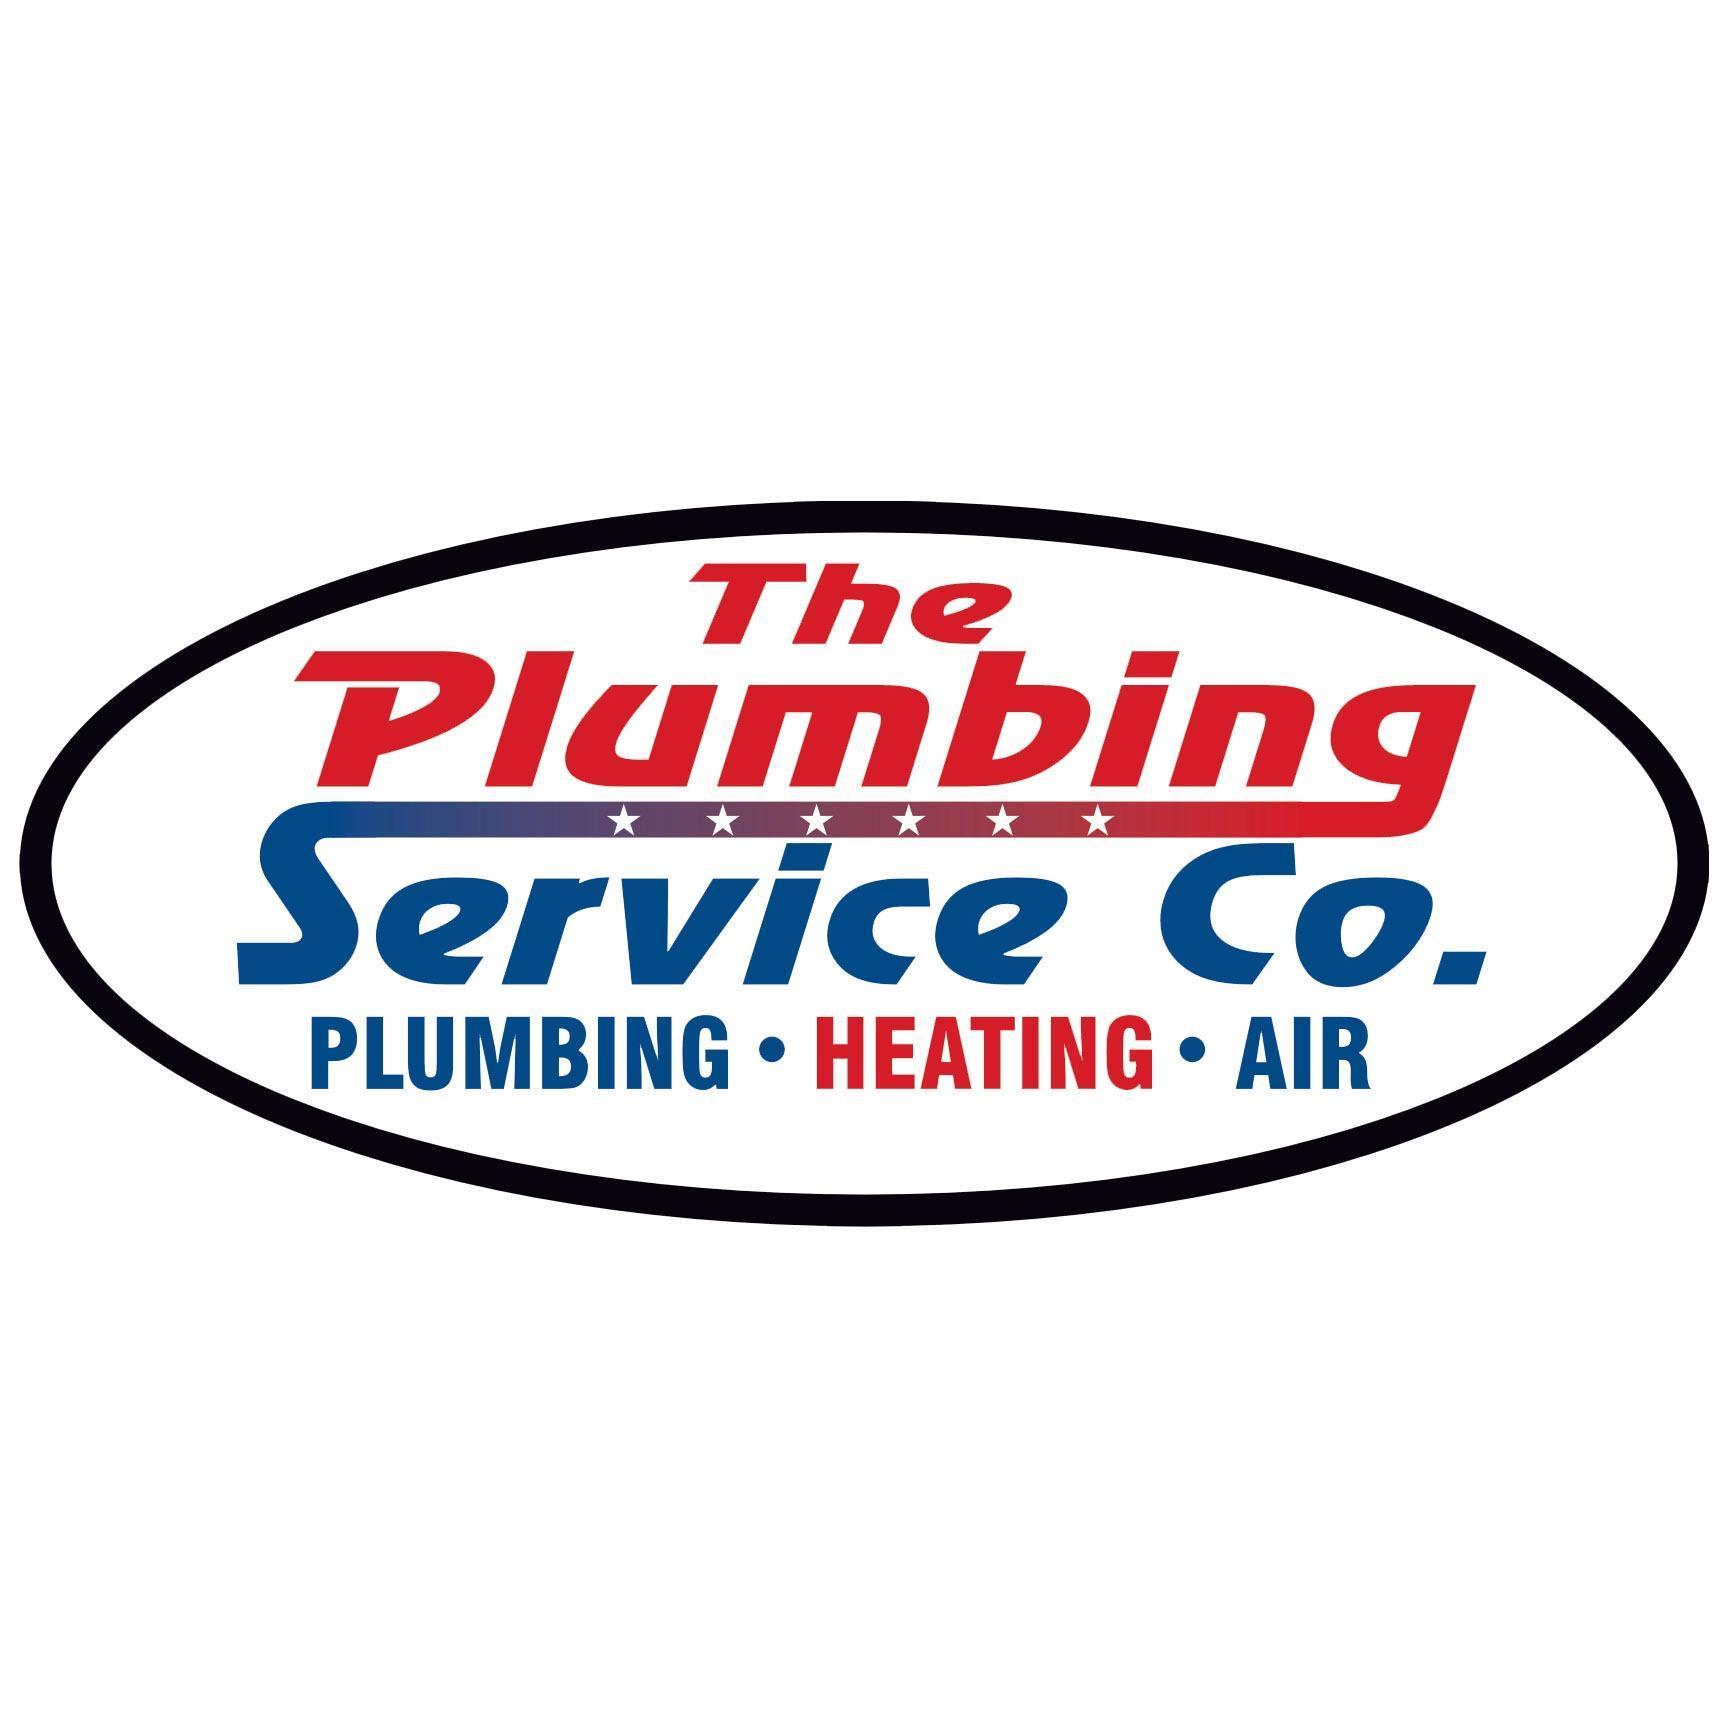 The Plumbing Service Company